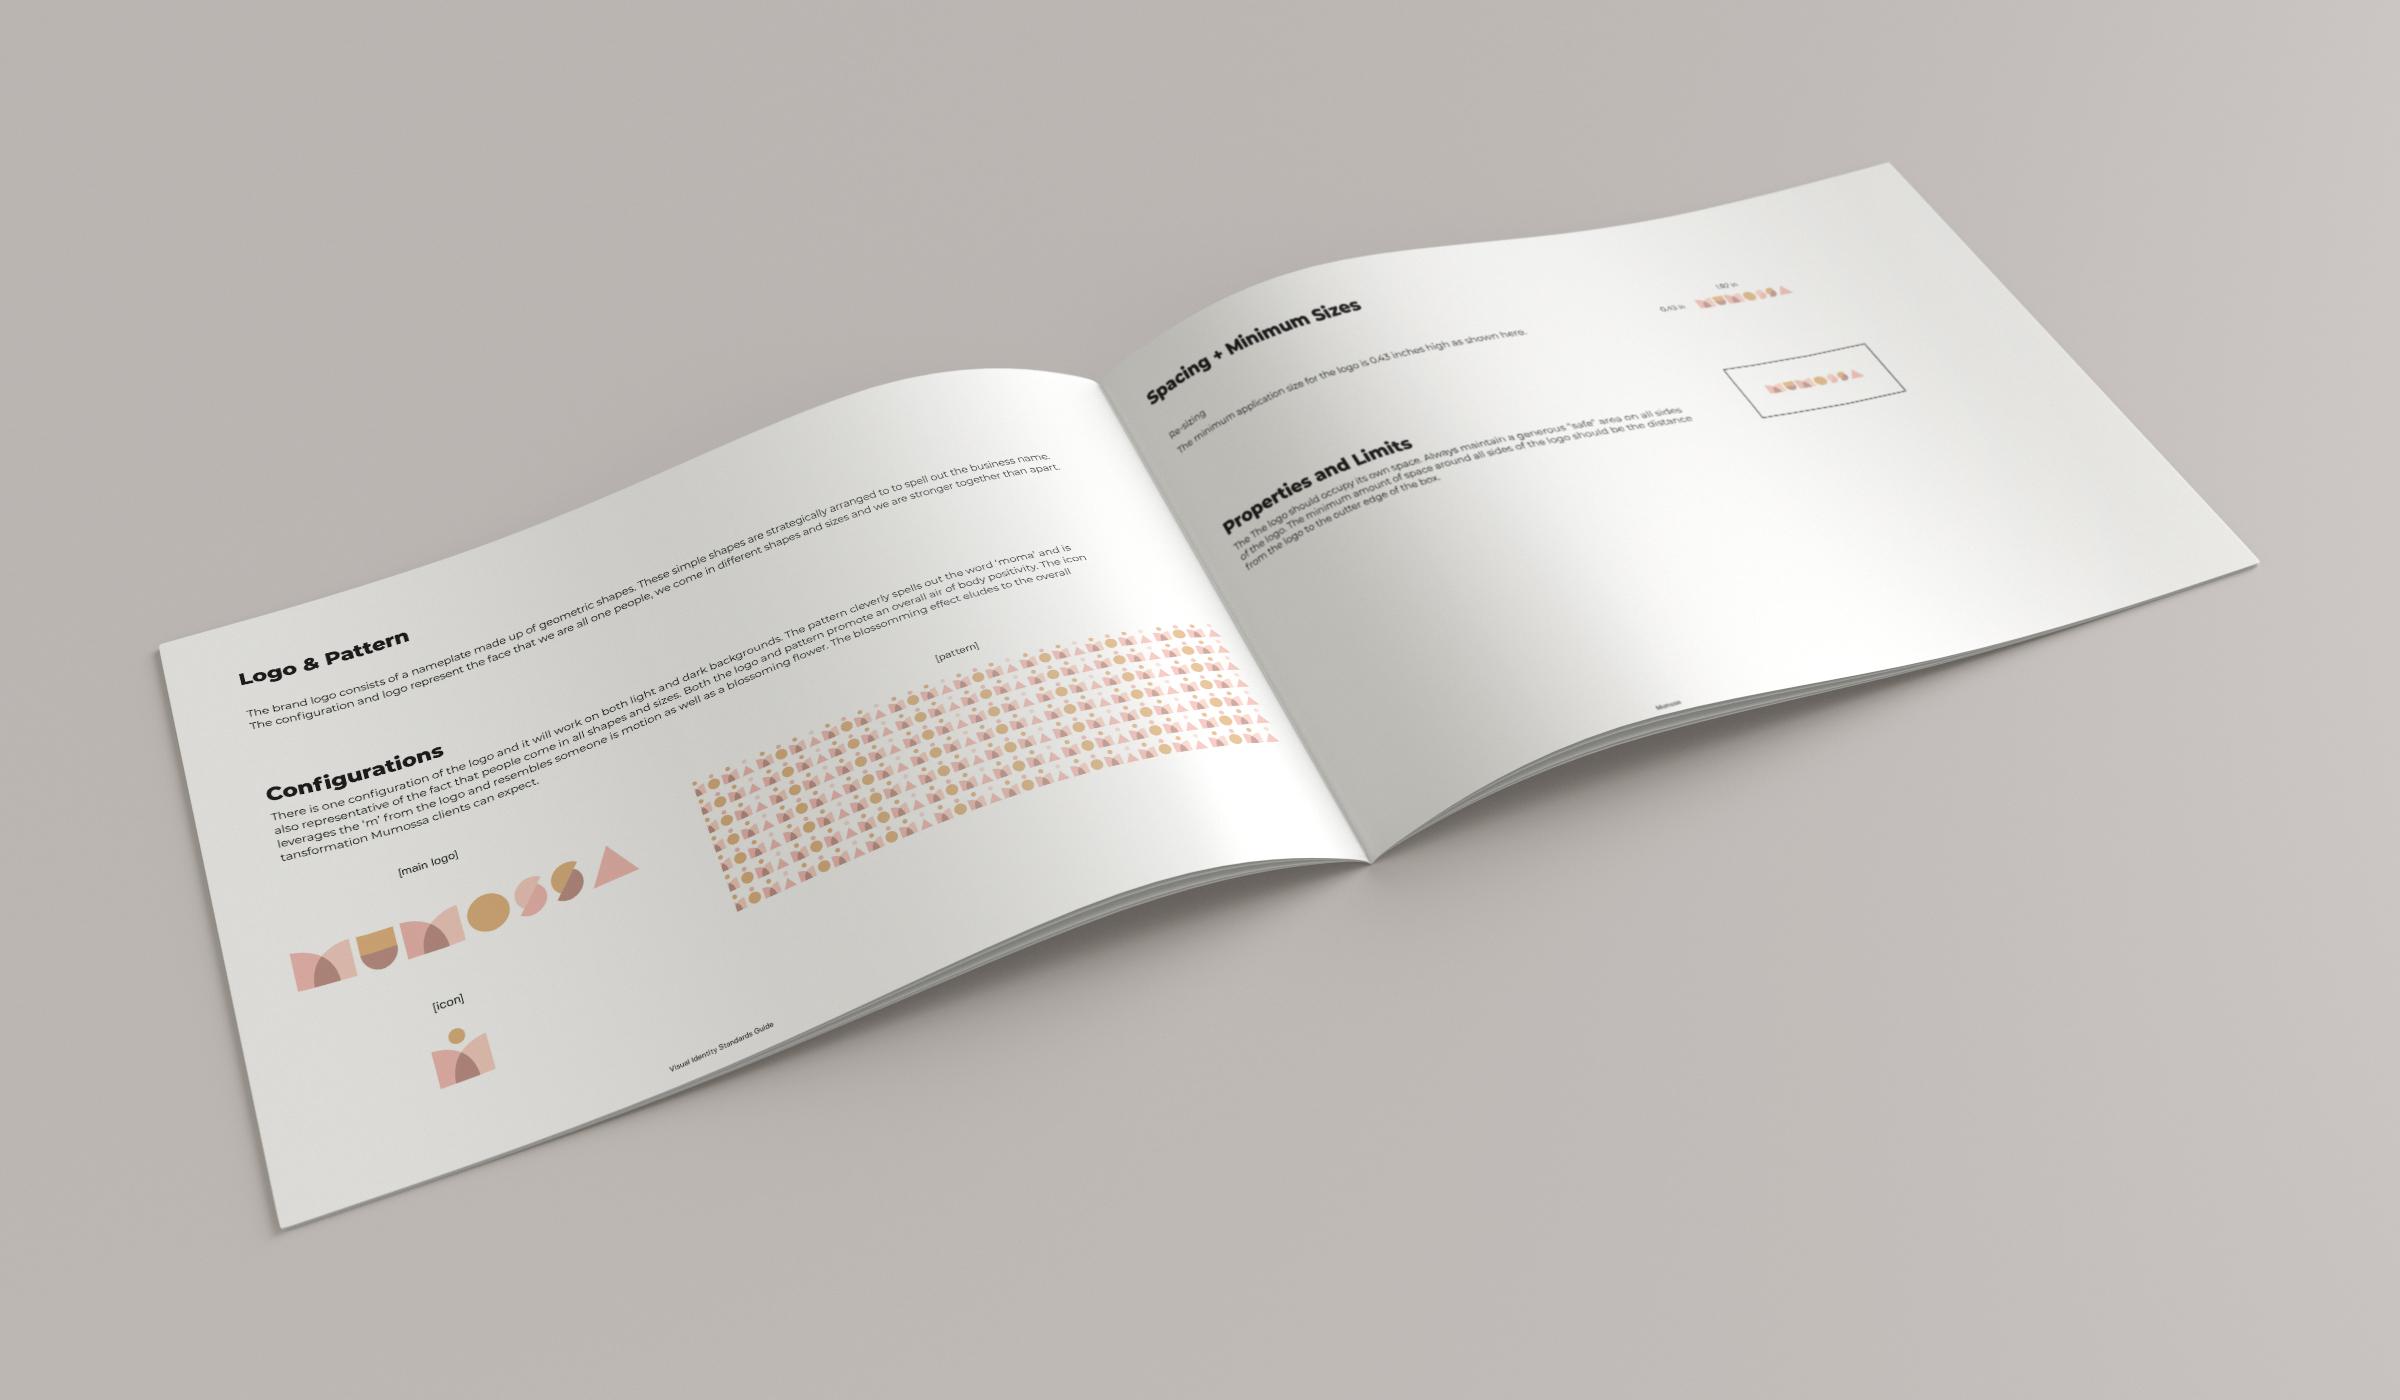 mumossa brand guide logo configurations